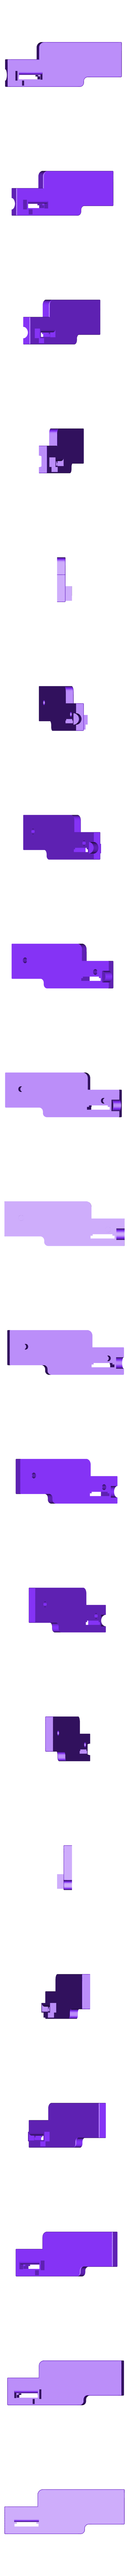 MG_hinten_rechts.stl Download free STL file Machine Gun Spandau MG08 • 3D print object, wersy